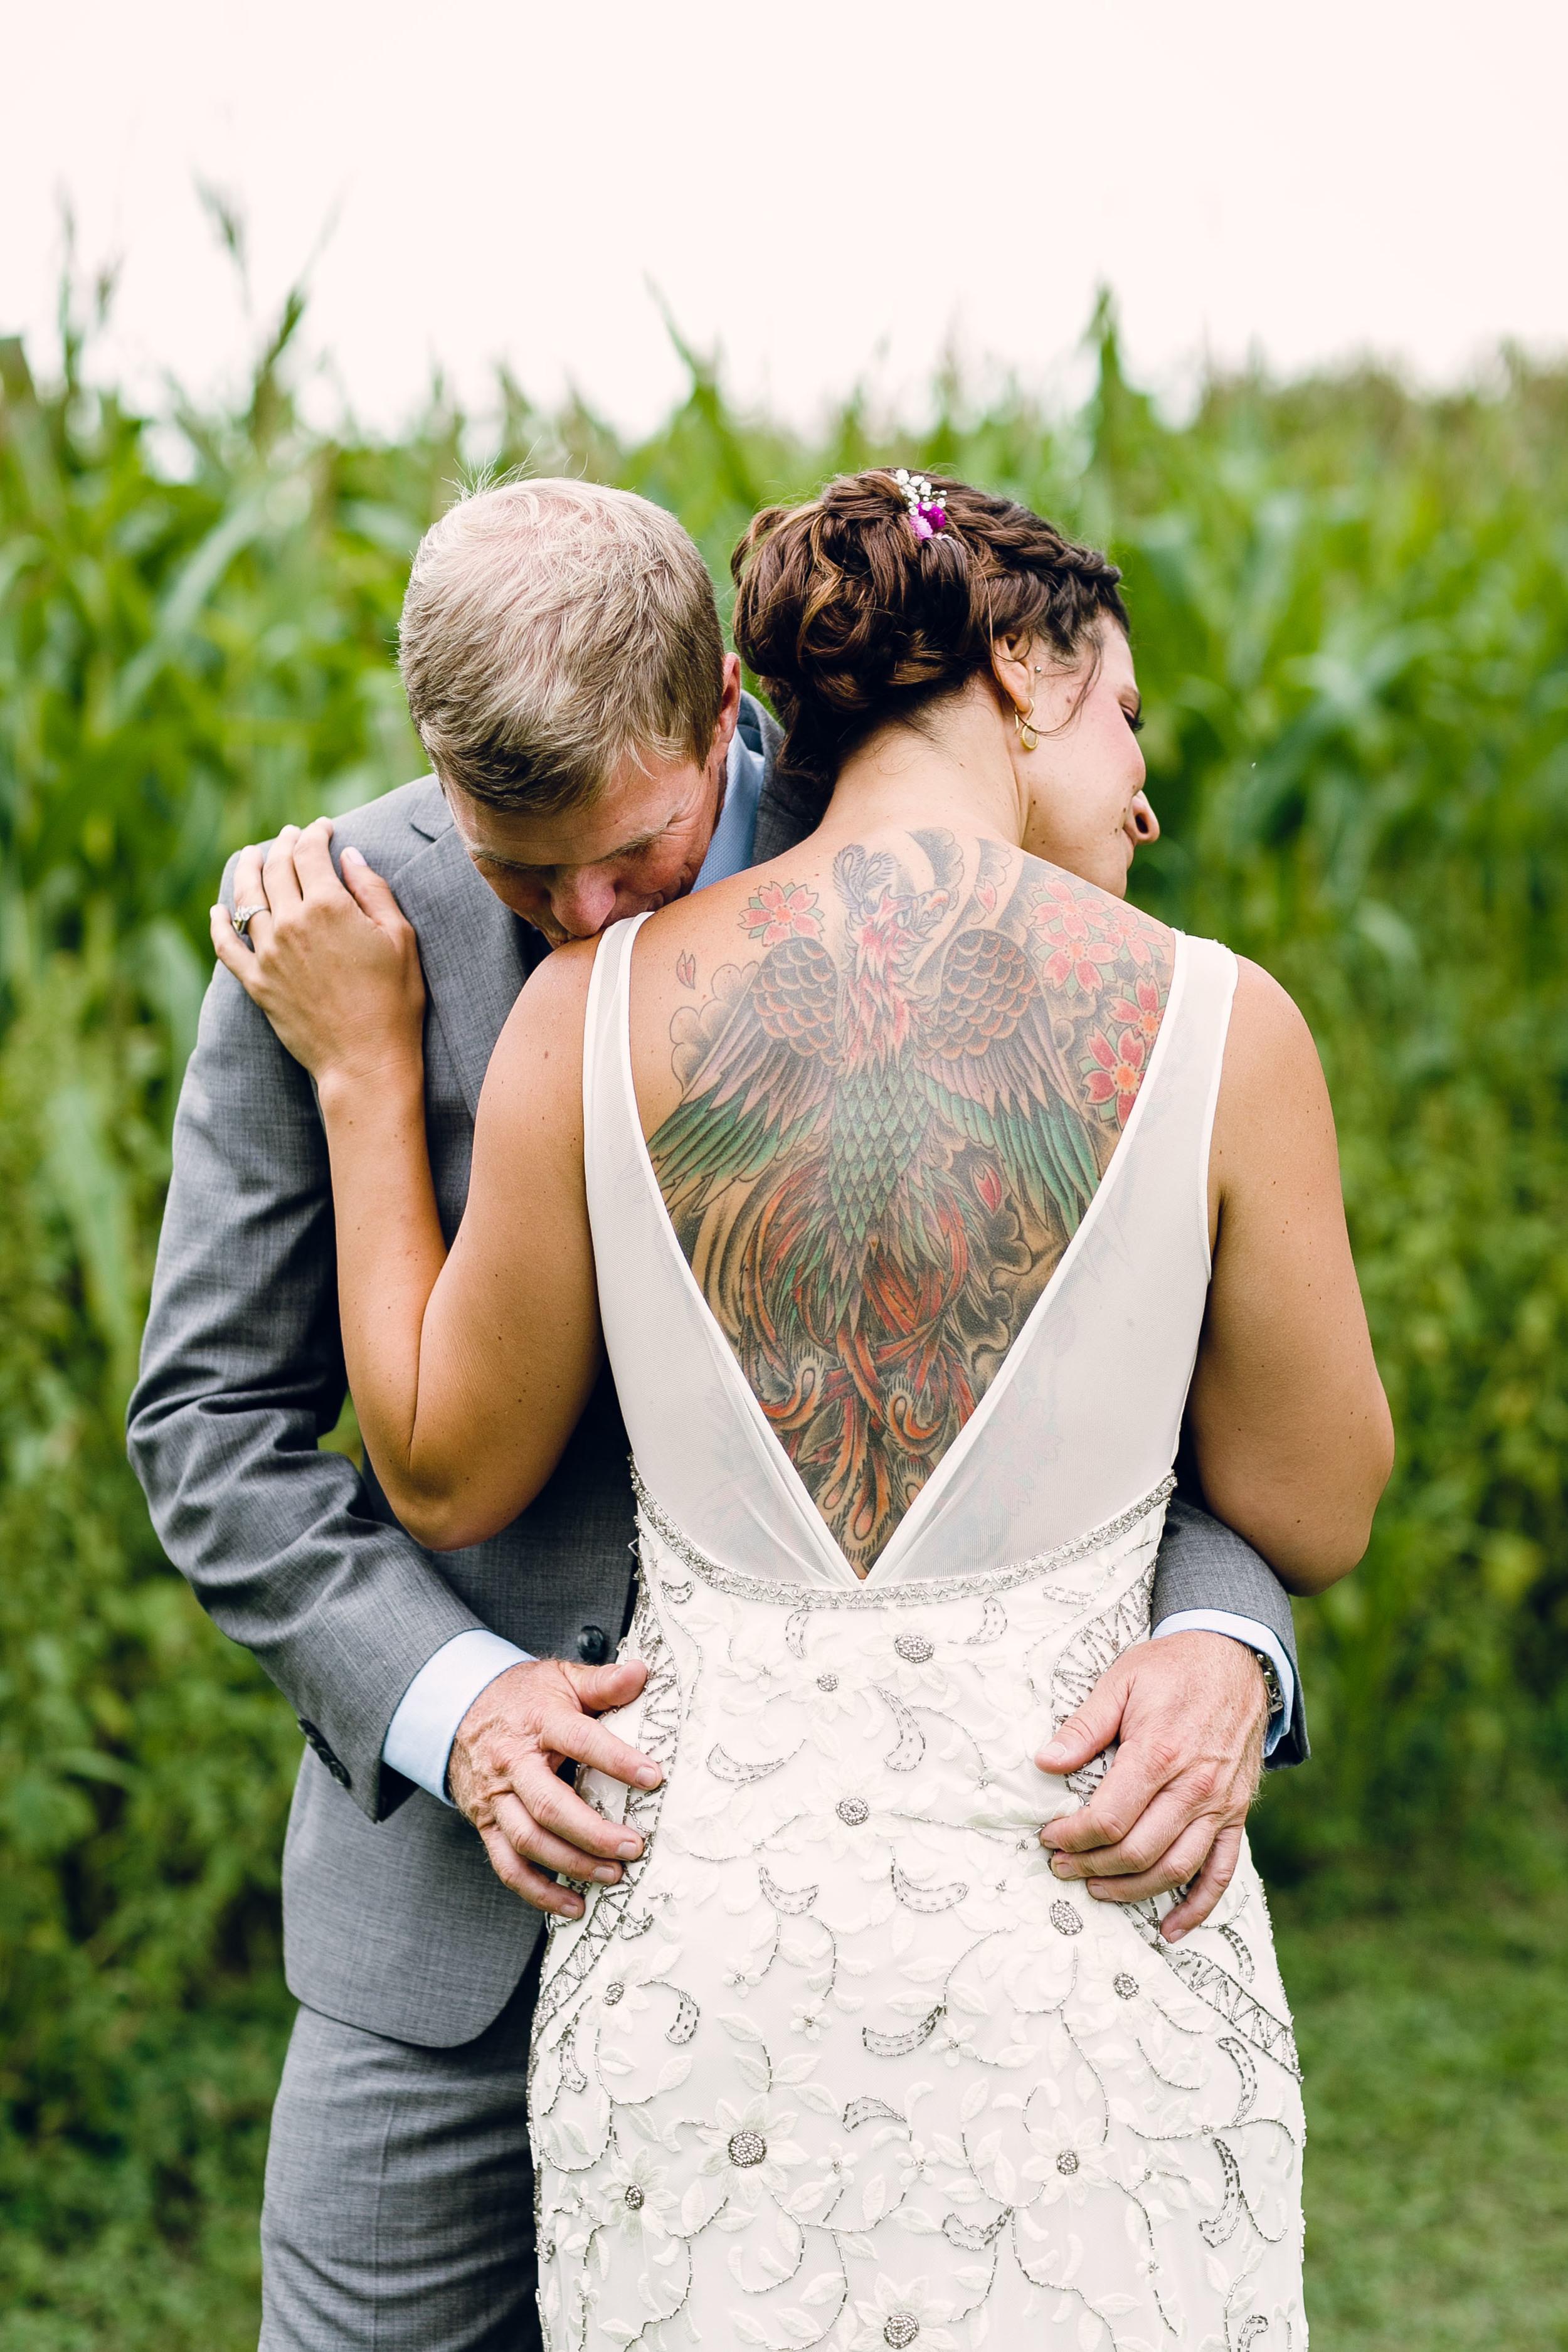 Rustic-Country-Style-Wedding-Connecticut-Farm-Photojornalistic-Wedding-Photography-by-Jacek-Dolata-8.jpg